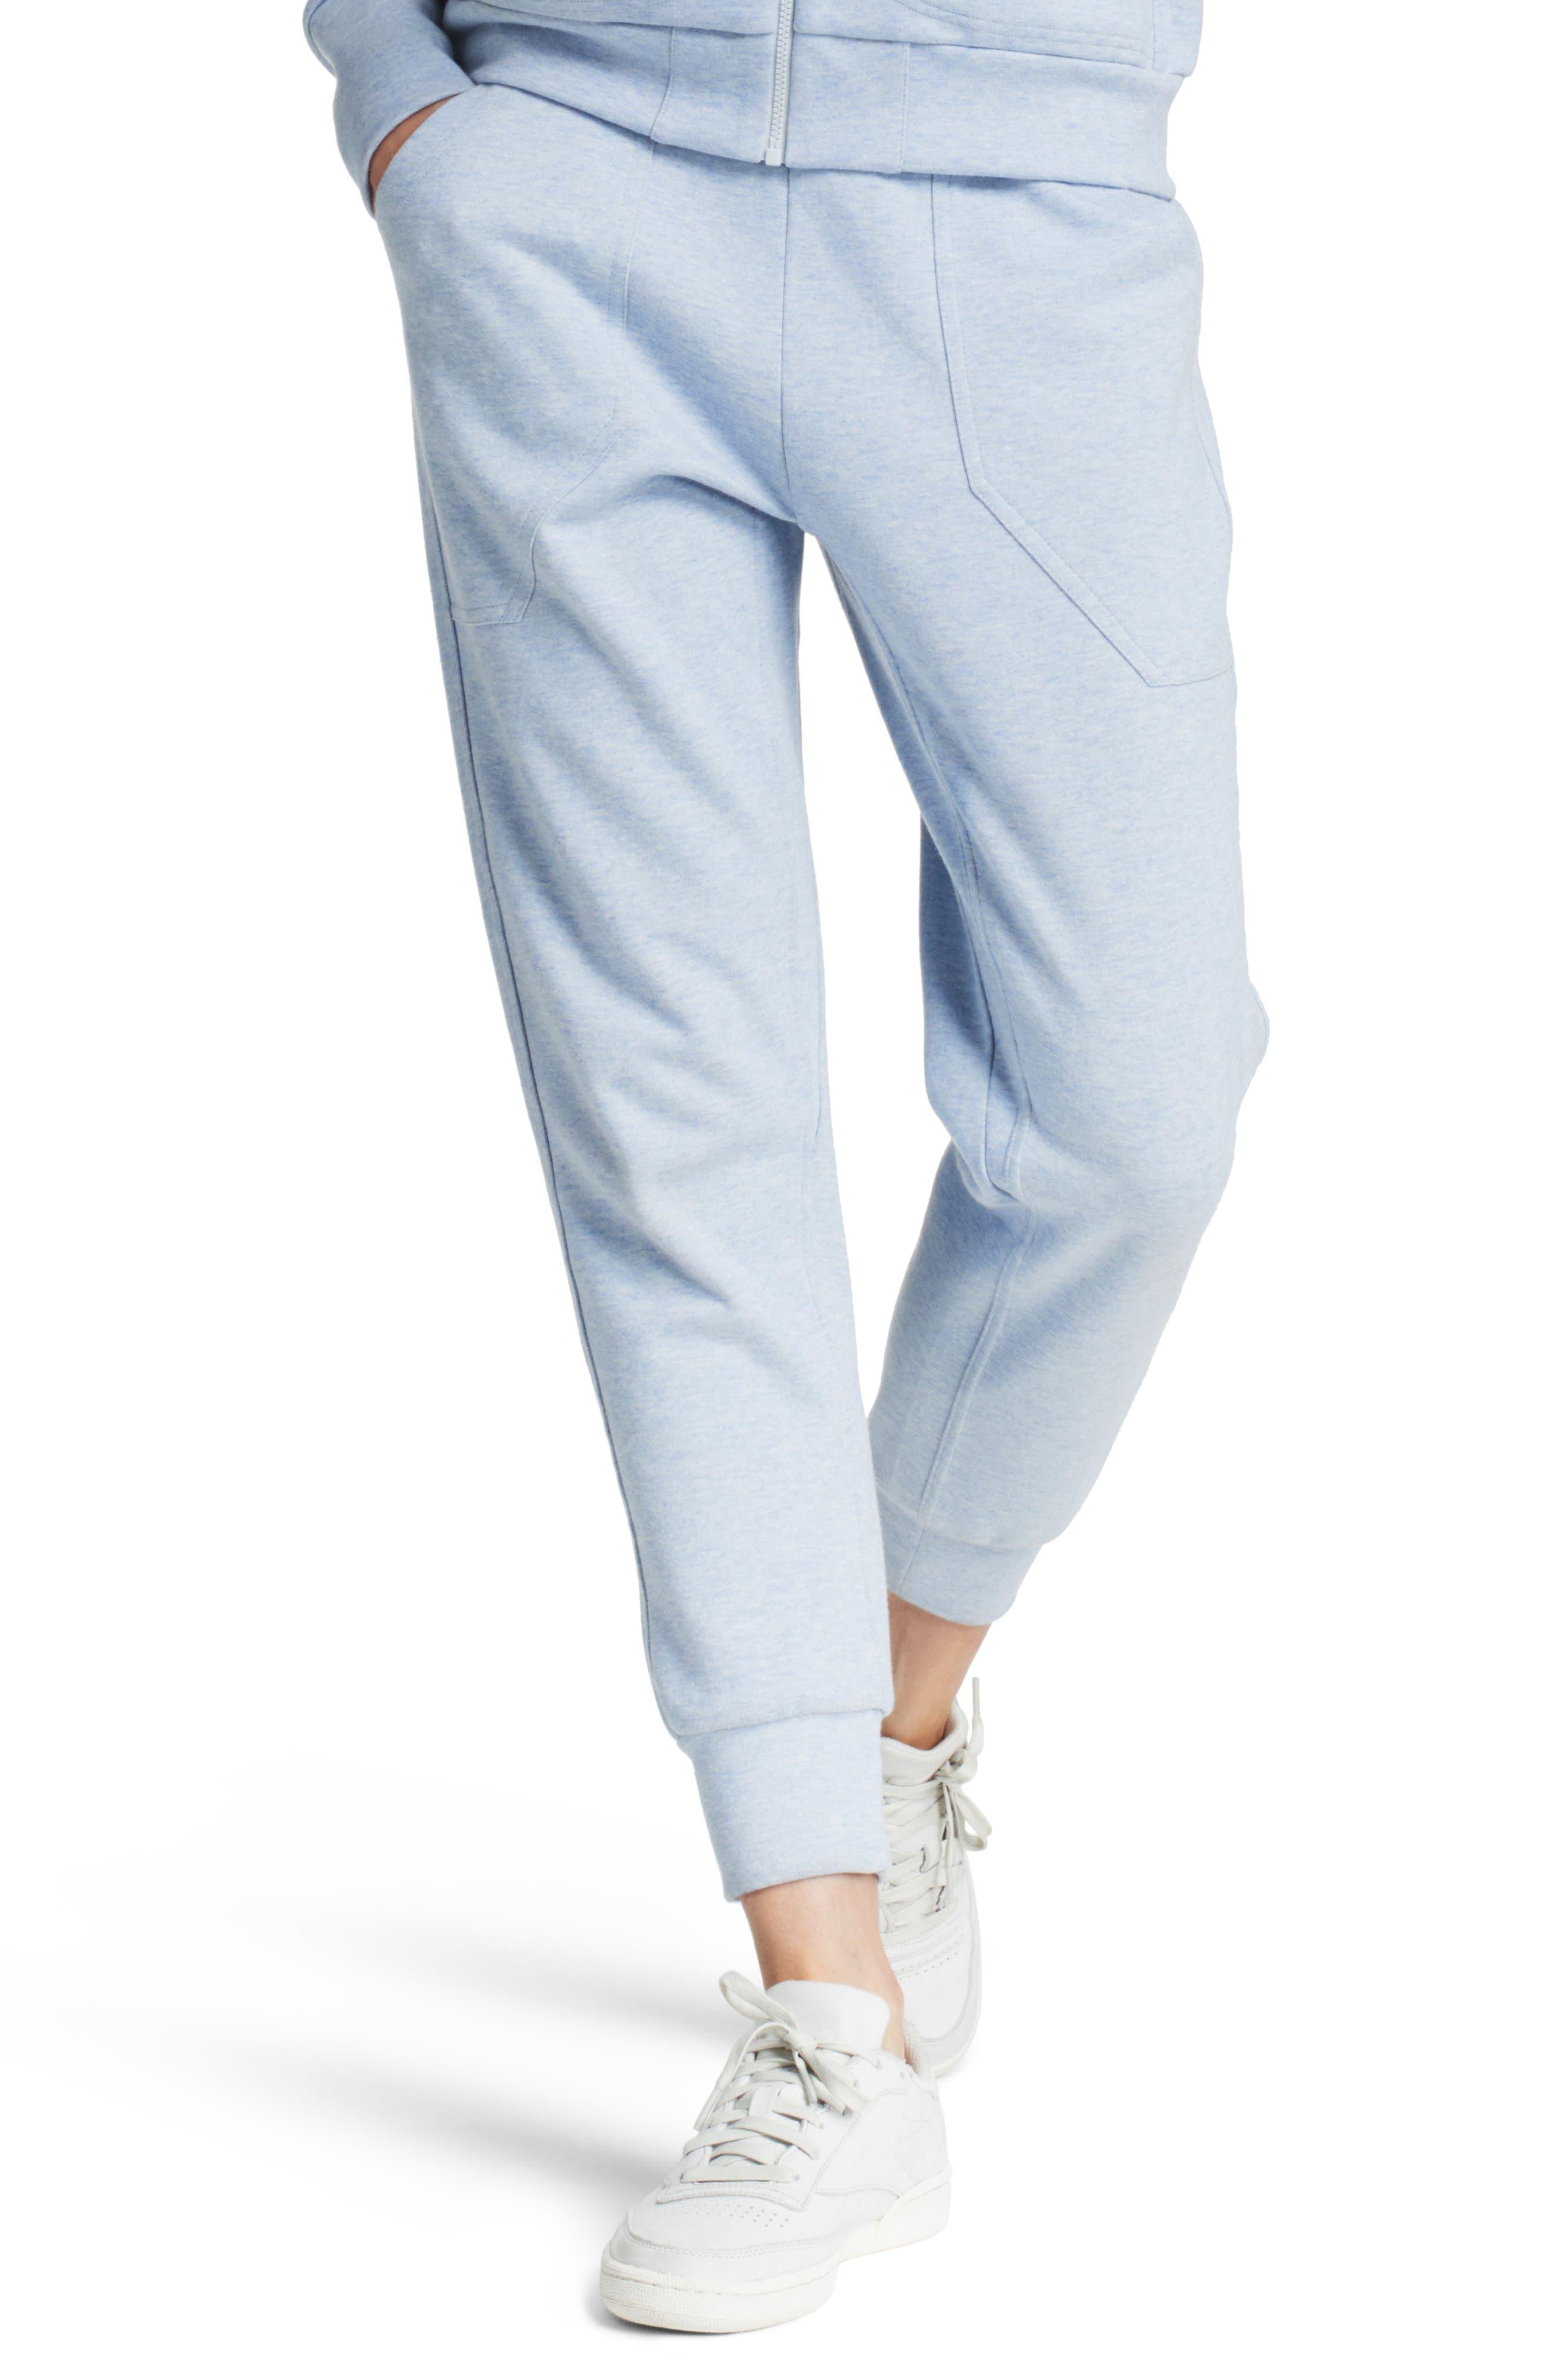 Synergy Track Pants,                         Main,                         color, Light Blue